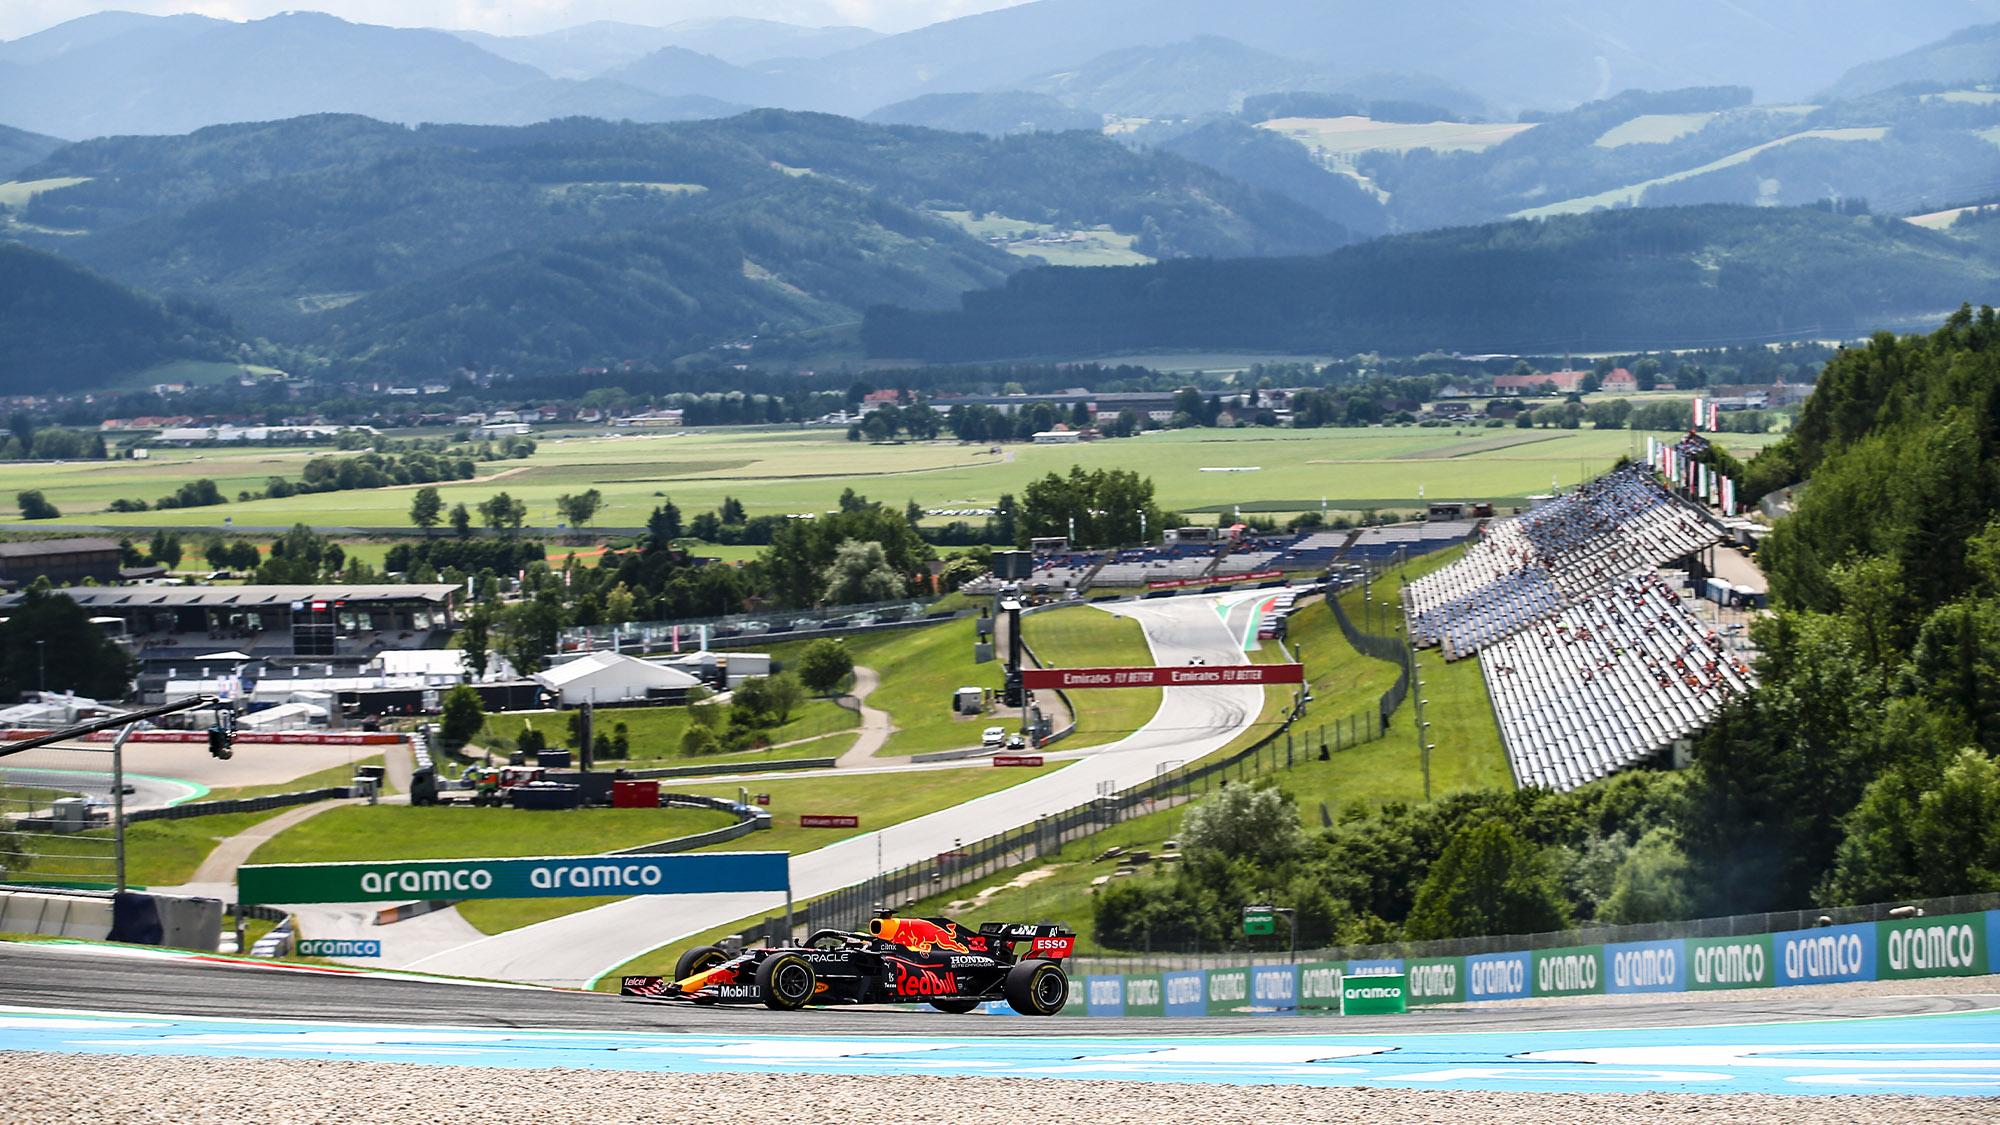 Max Verstappen qualifying for the 2021 Styrian Grand Prix